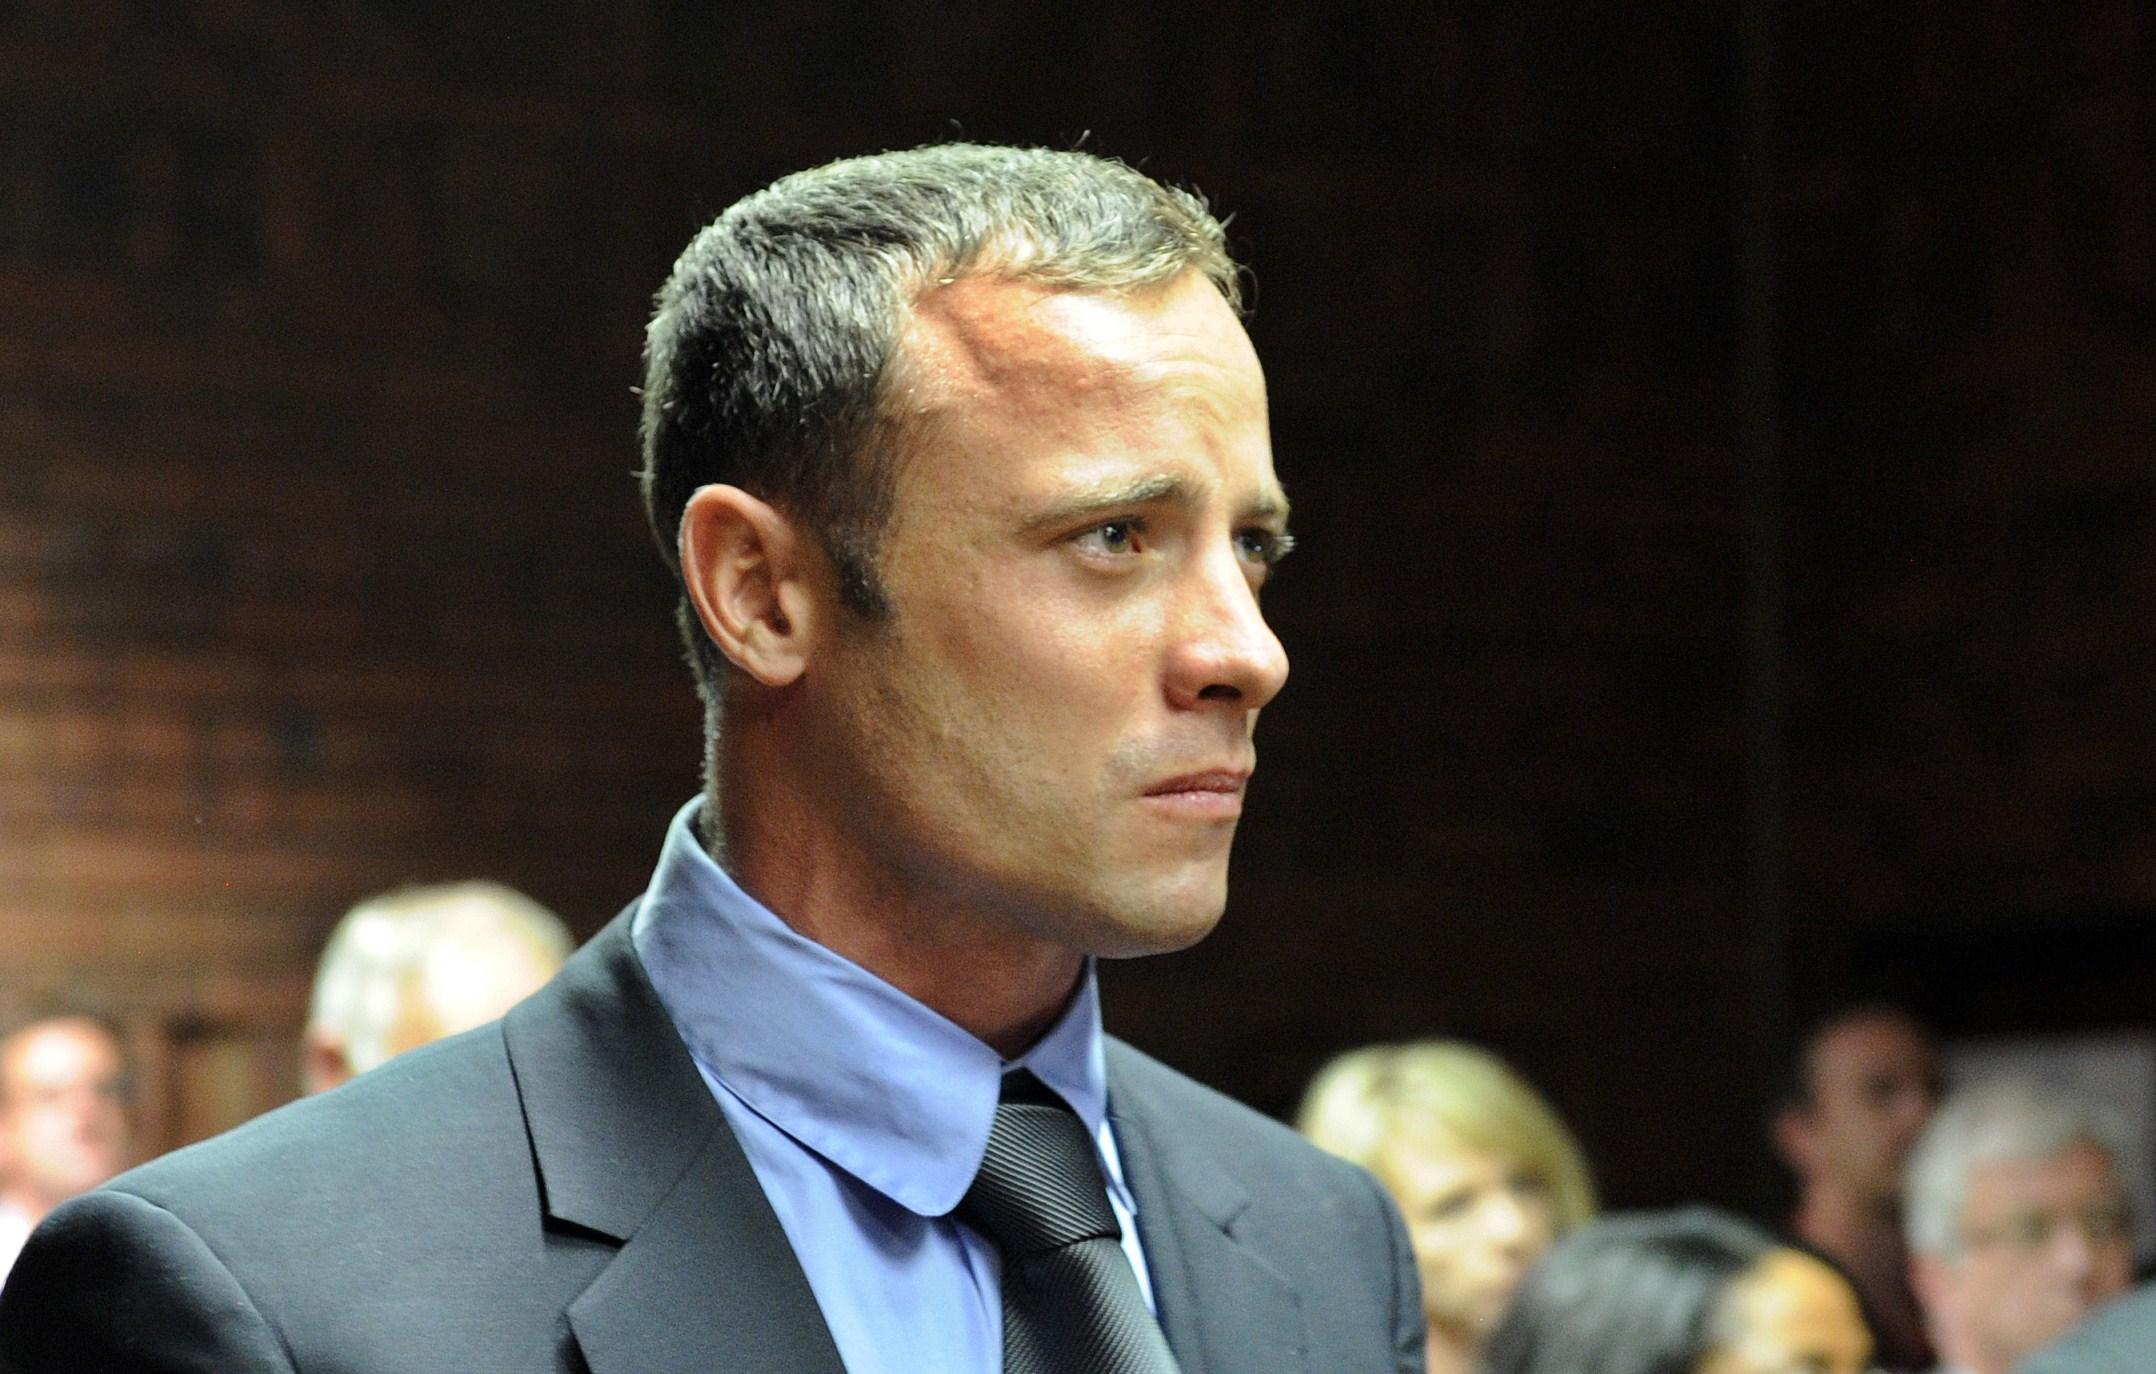 A stat 7 luni in proces si 10 in inchisoare. Oscar Pistorius va fi eliberat conditionat saptamana viitoare